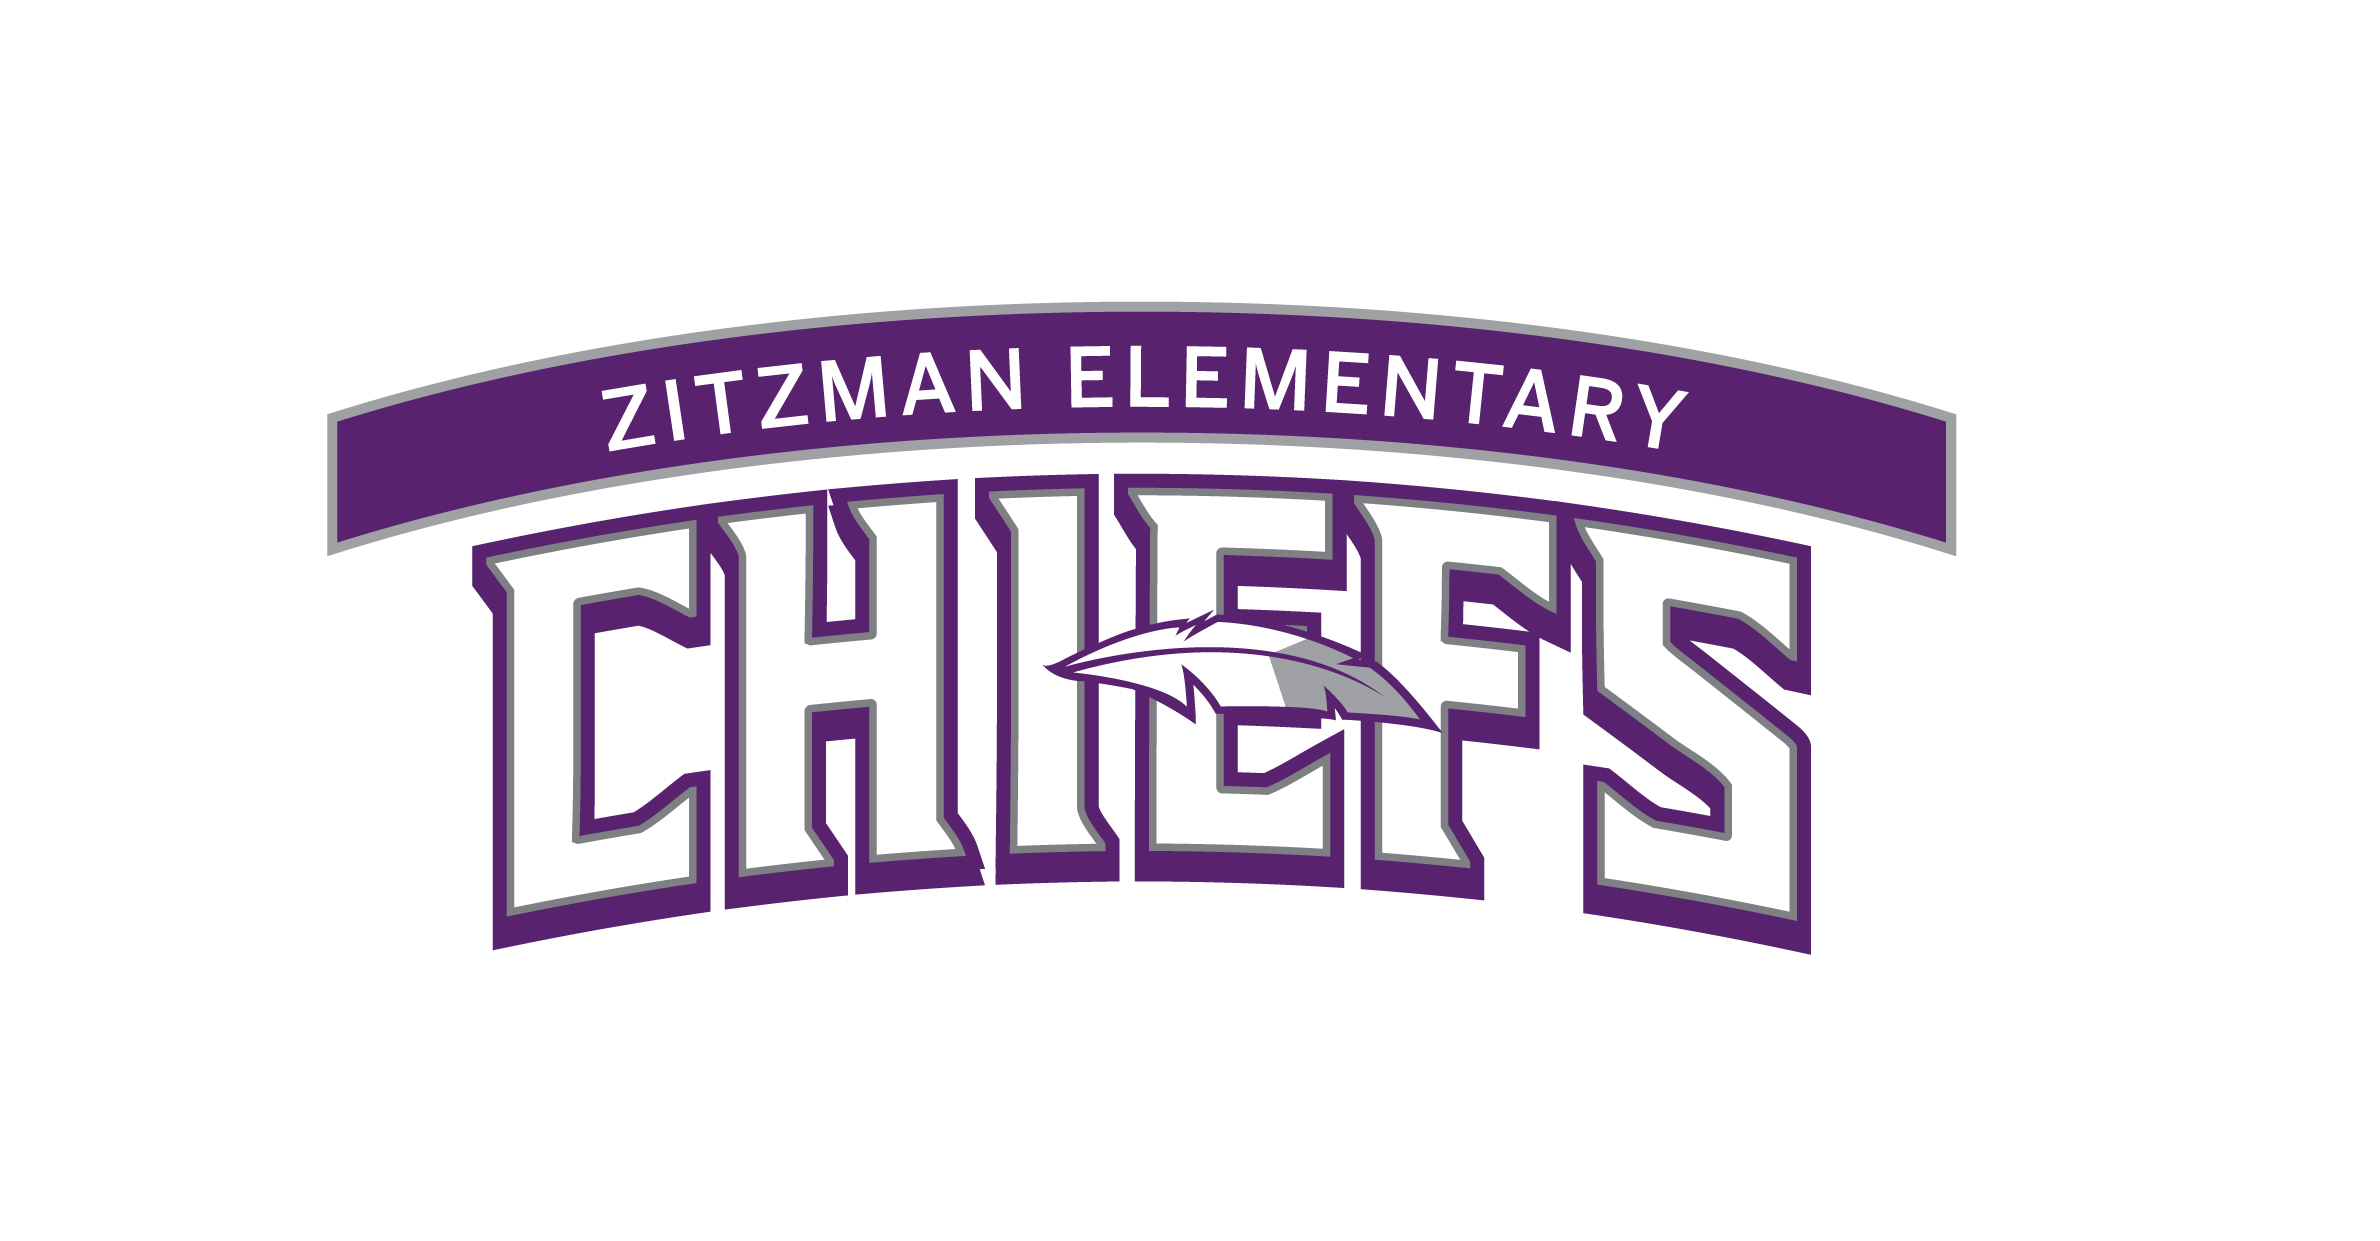 Zitzman Elementary Chiefs